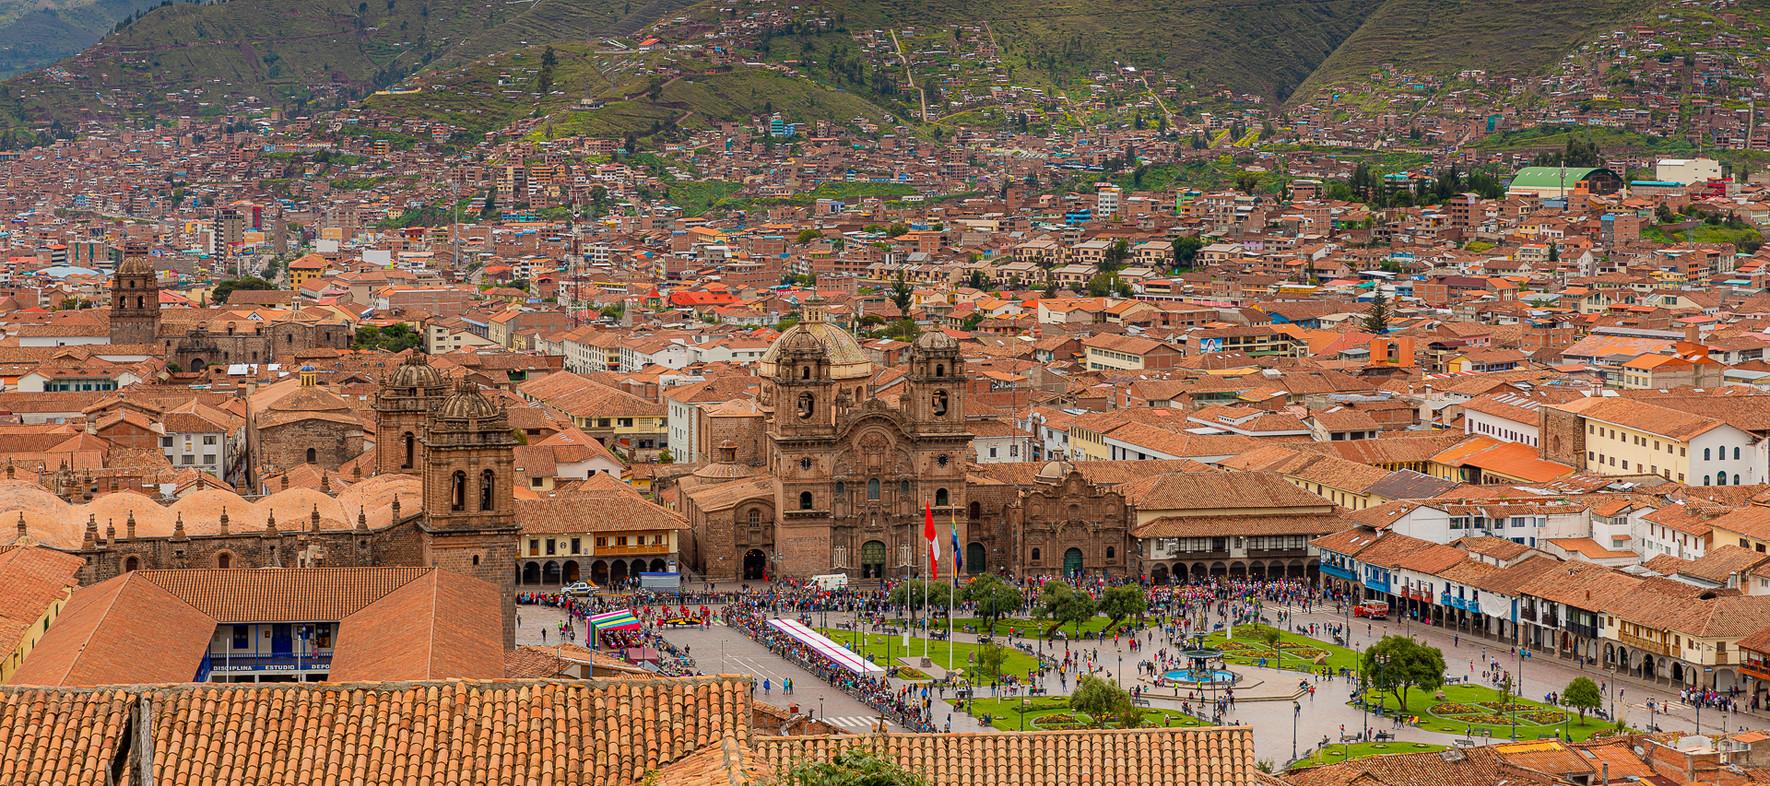 TKPA-Cusco201802-0021-HDWH.jpg